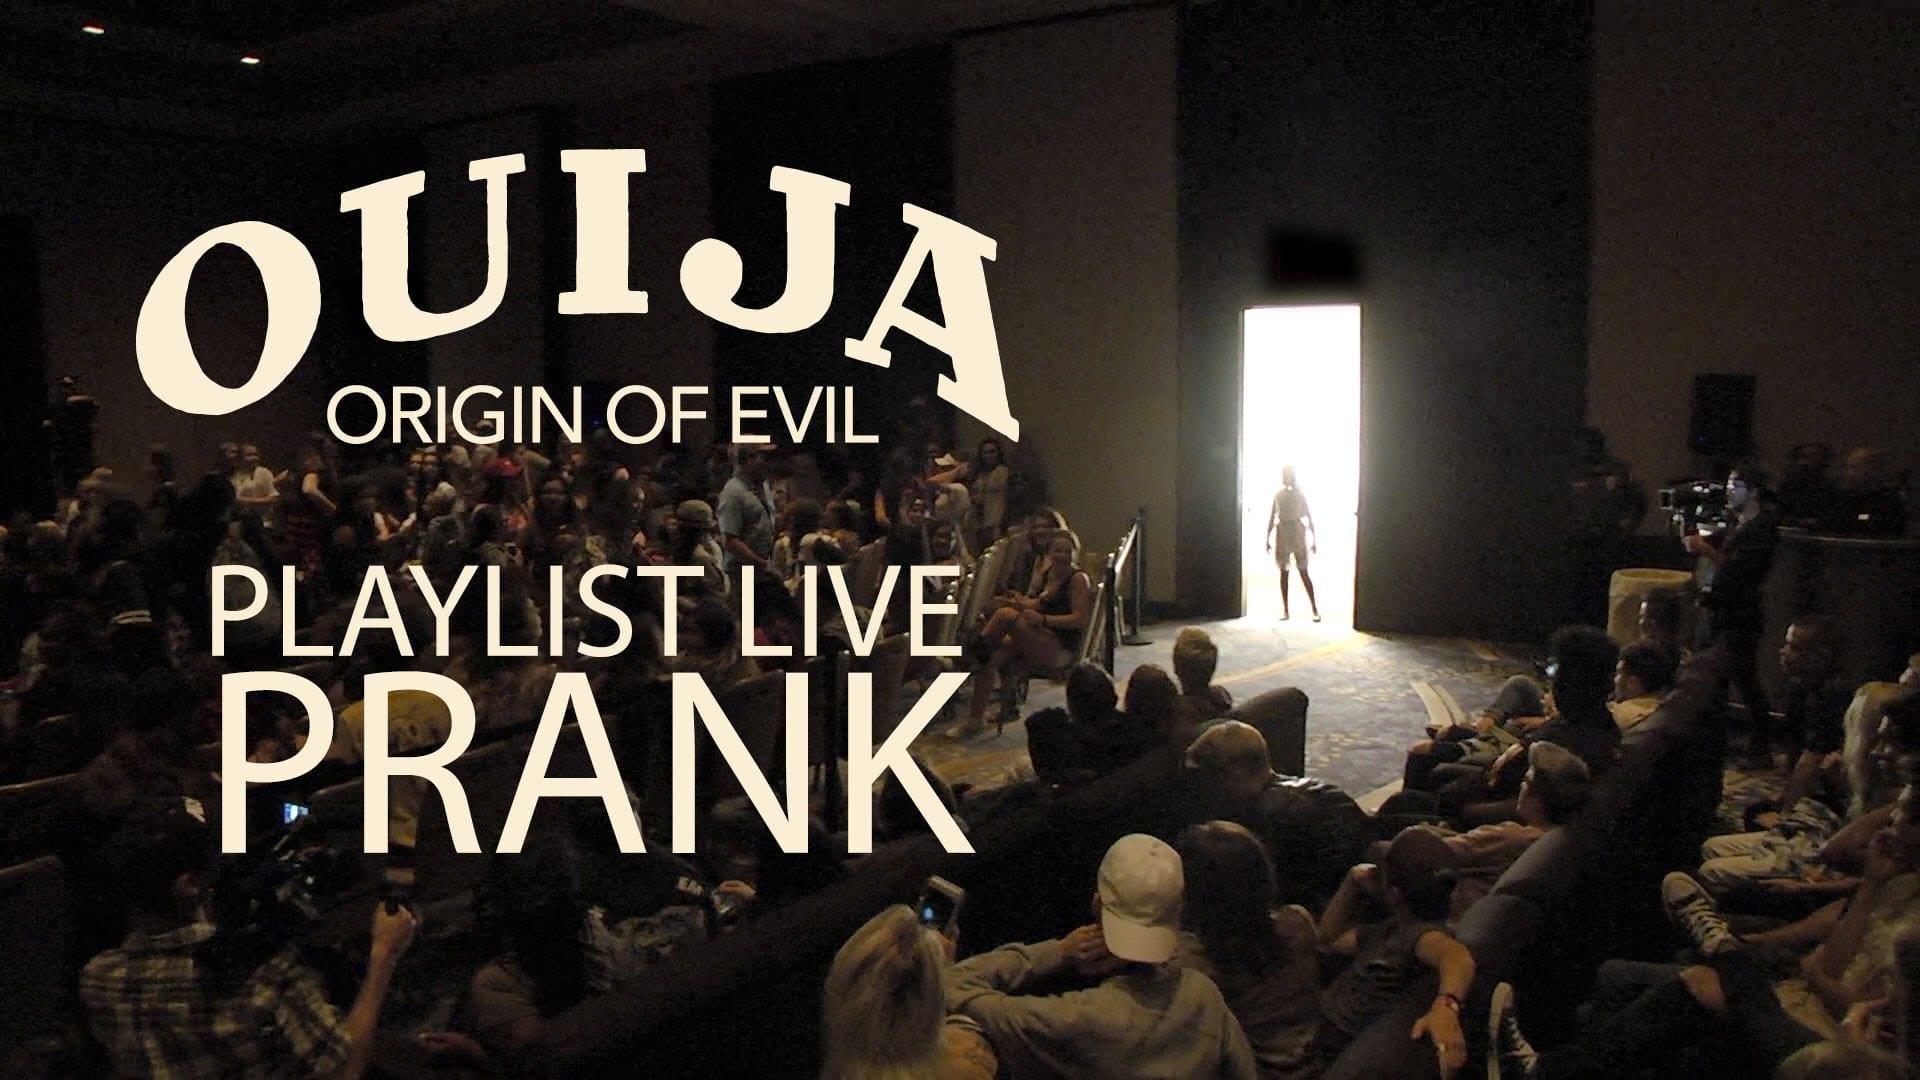 Universal Pictures: Ouija – Origin of Evil – Live Prank